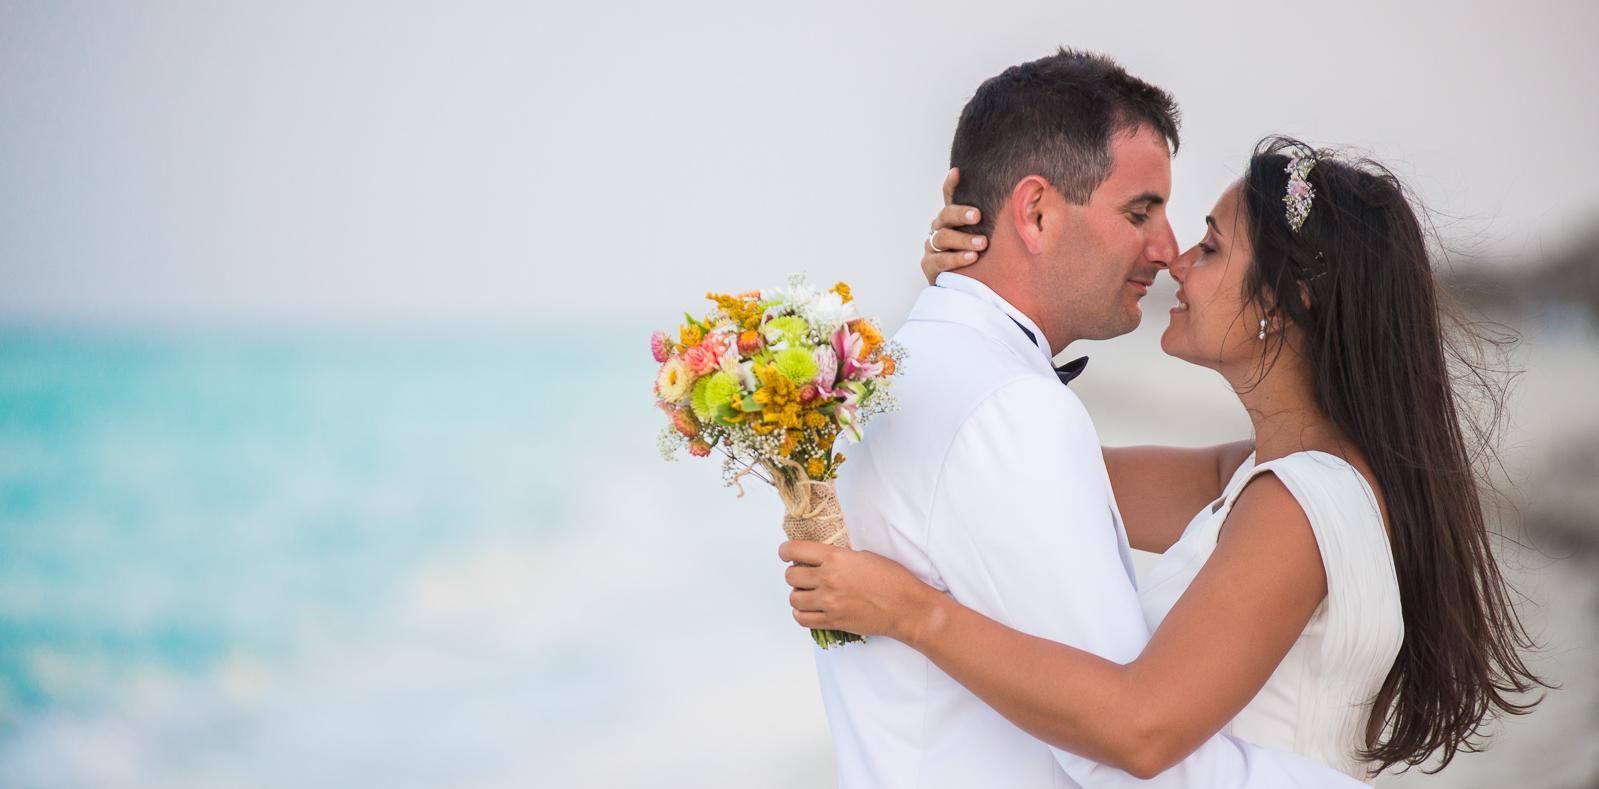 bodas-rustico-playa-cuba-6564.jpg